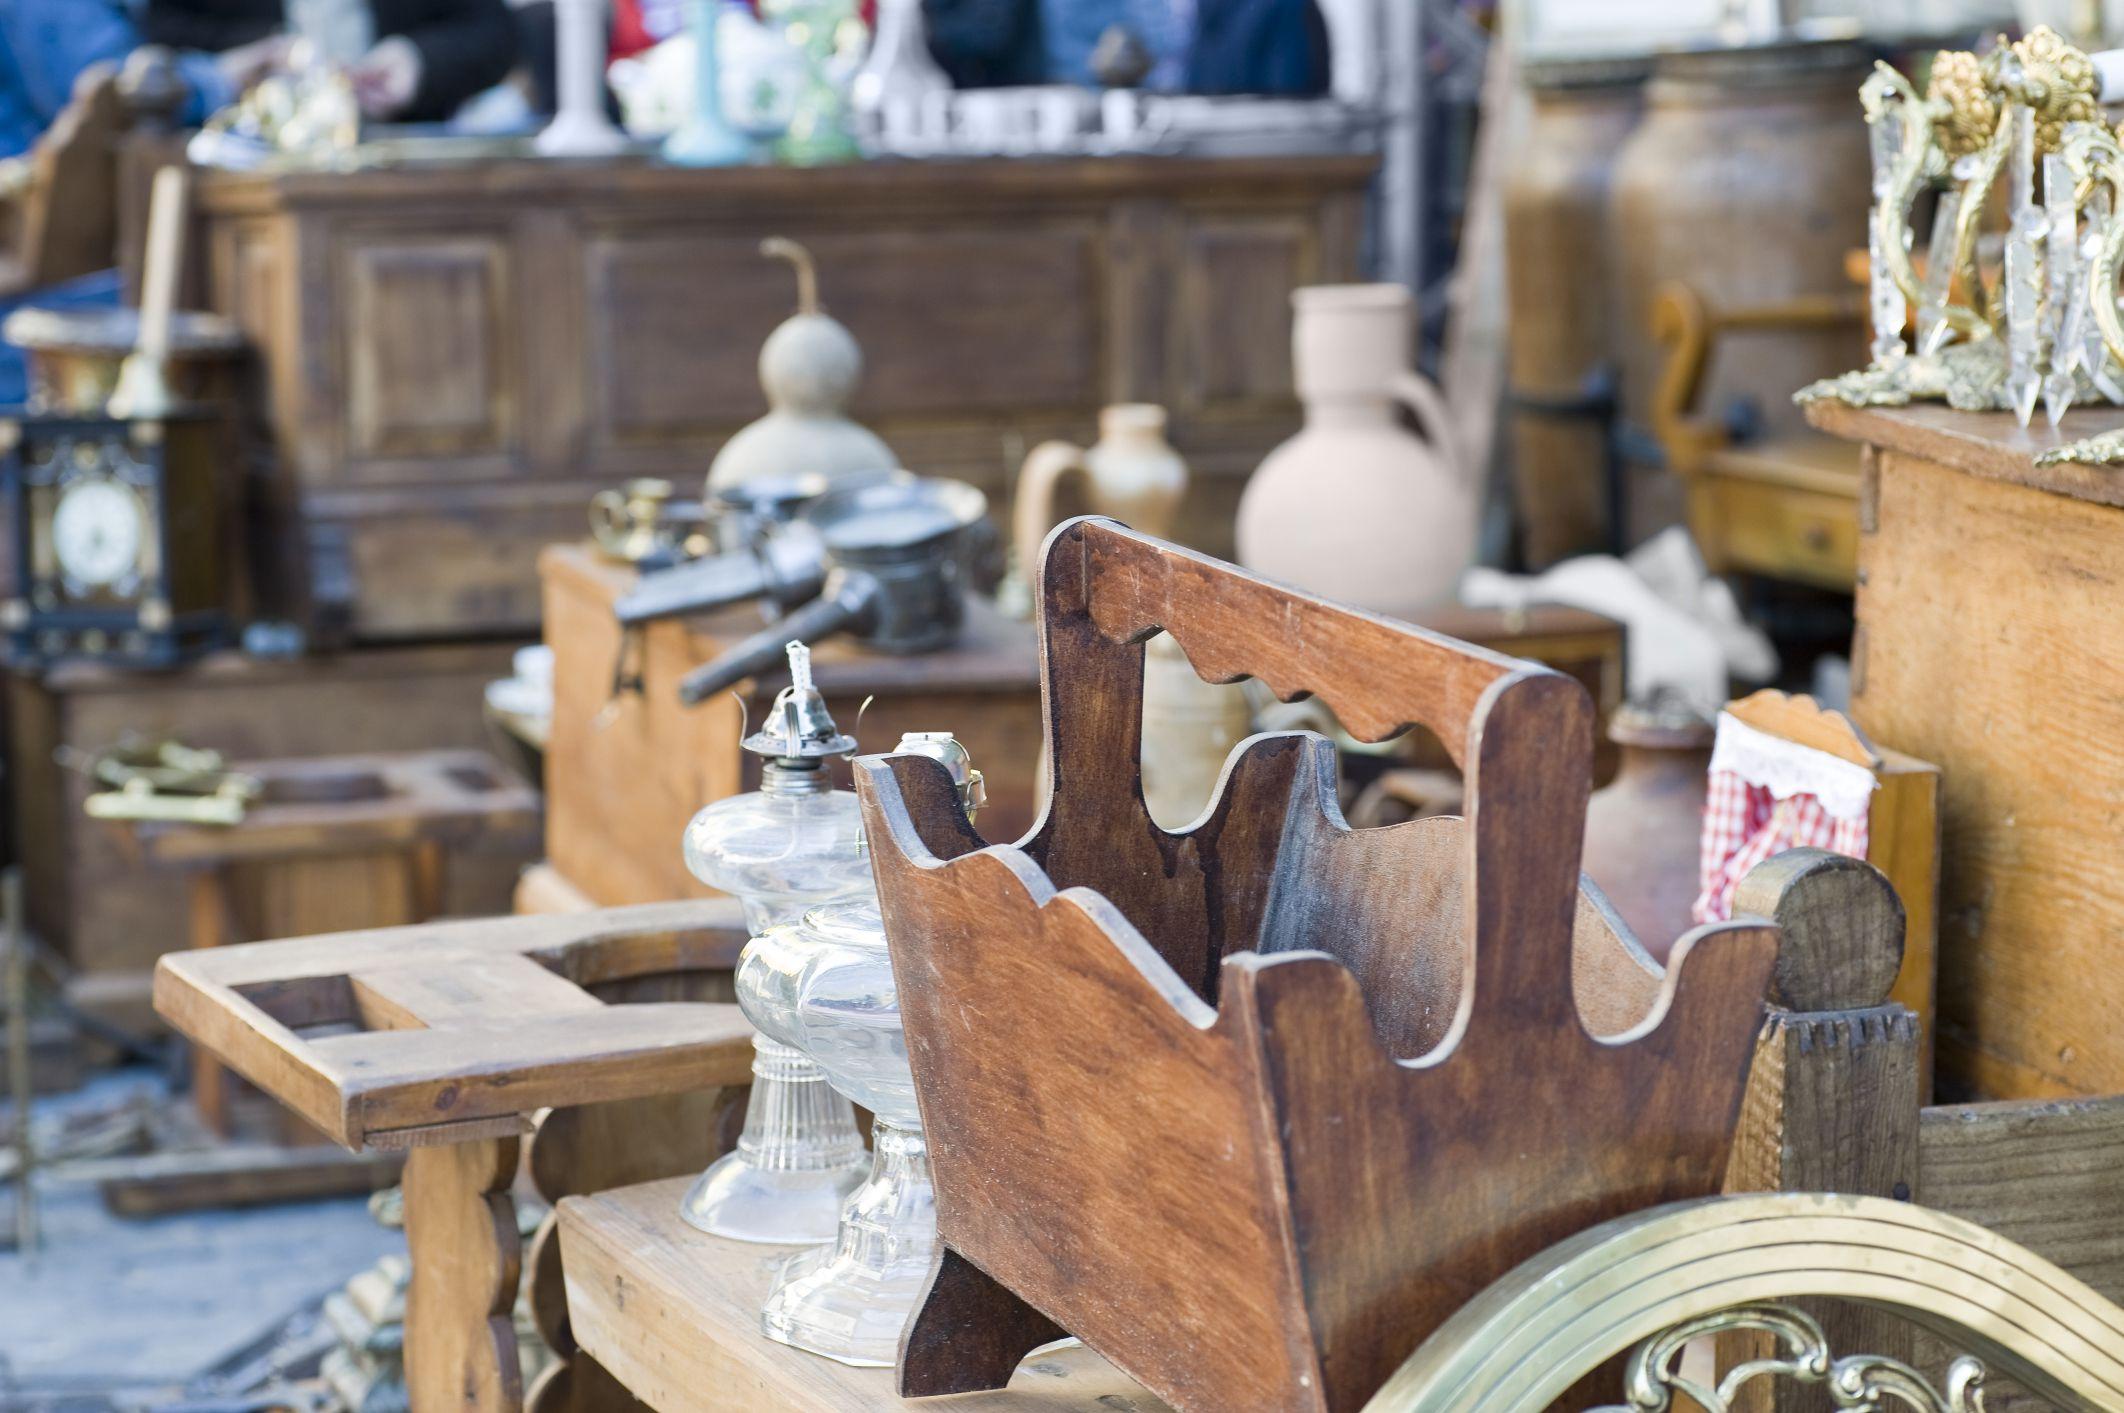 yard sales in missouri offer bargains galore